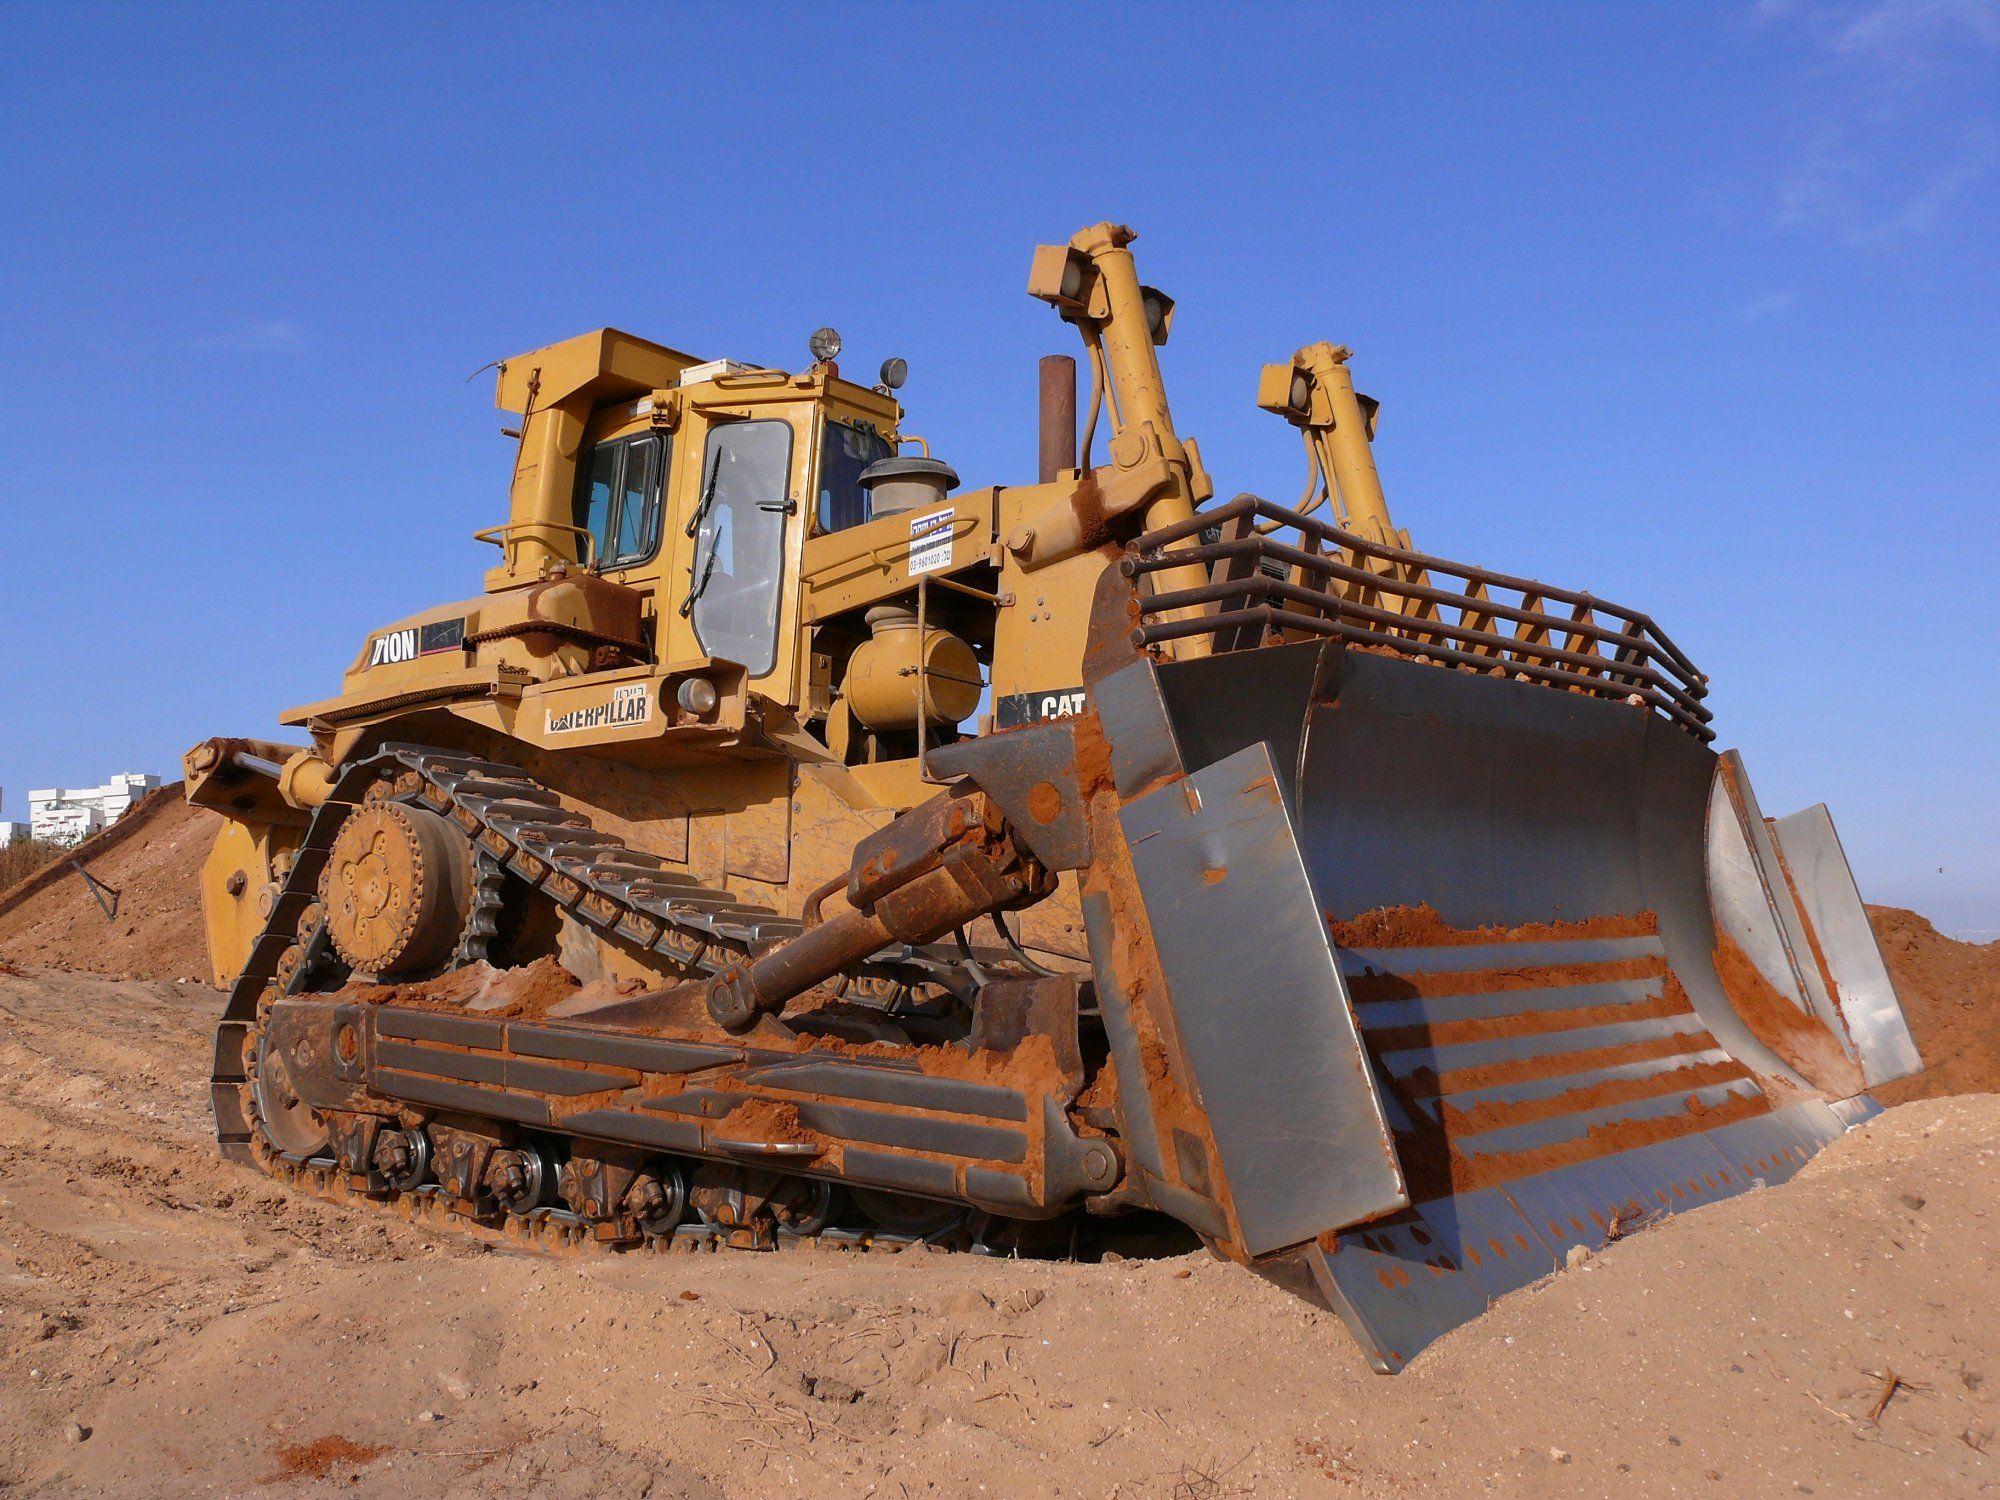 bulldozer Google Search Heavy equipment, Earth moving